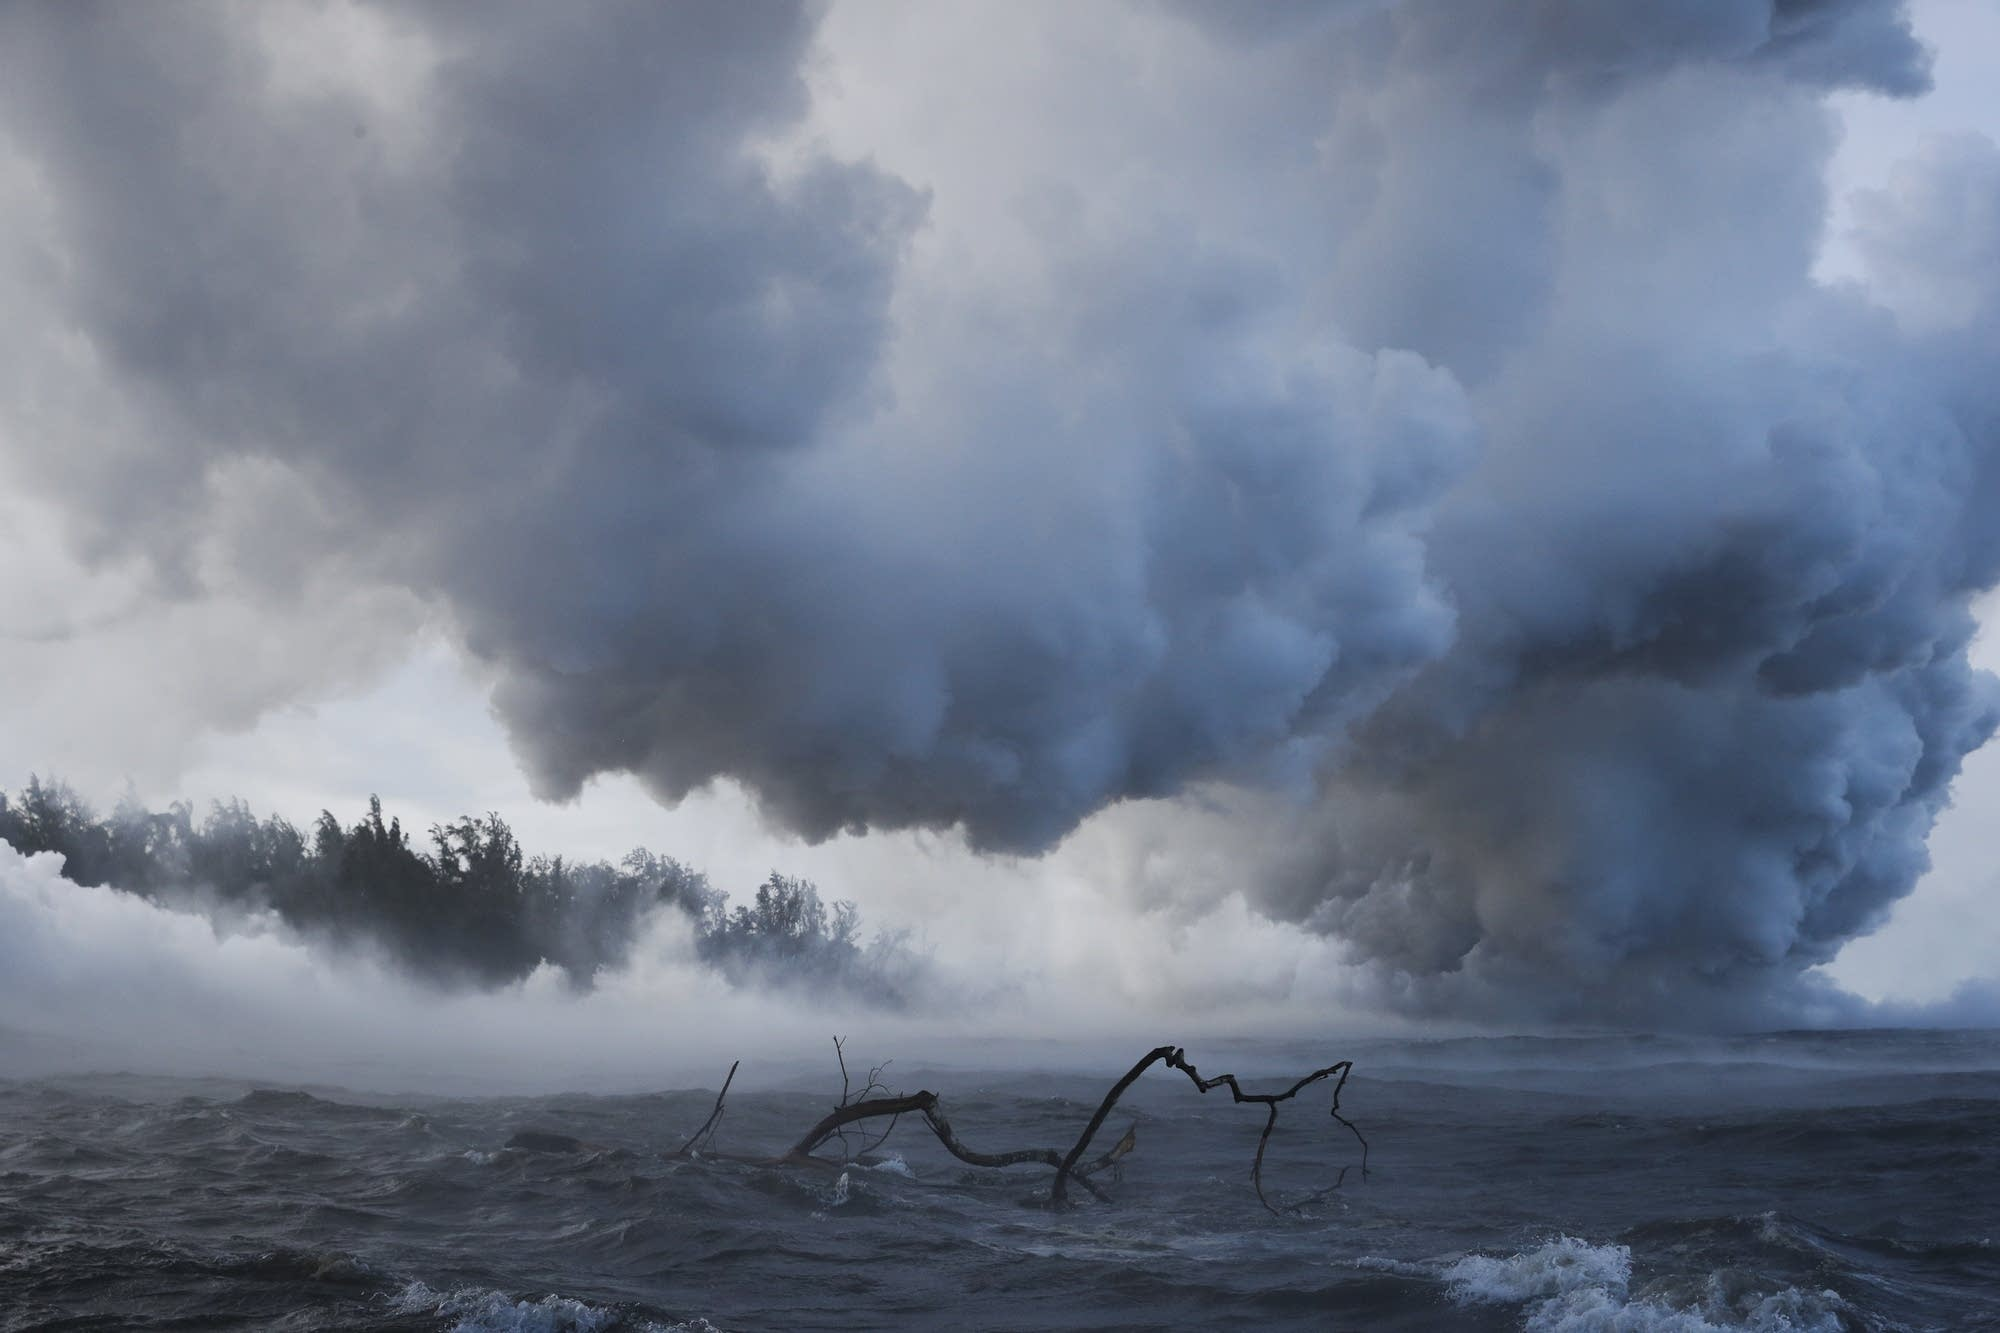 Plumes of steam rise as lava enters the ocean near Pahoa, Hawaii.